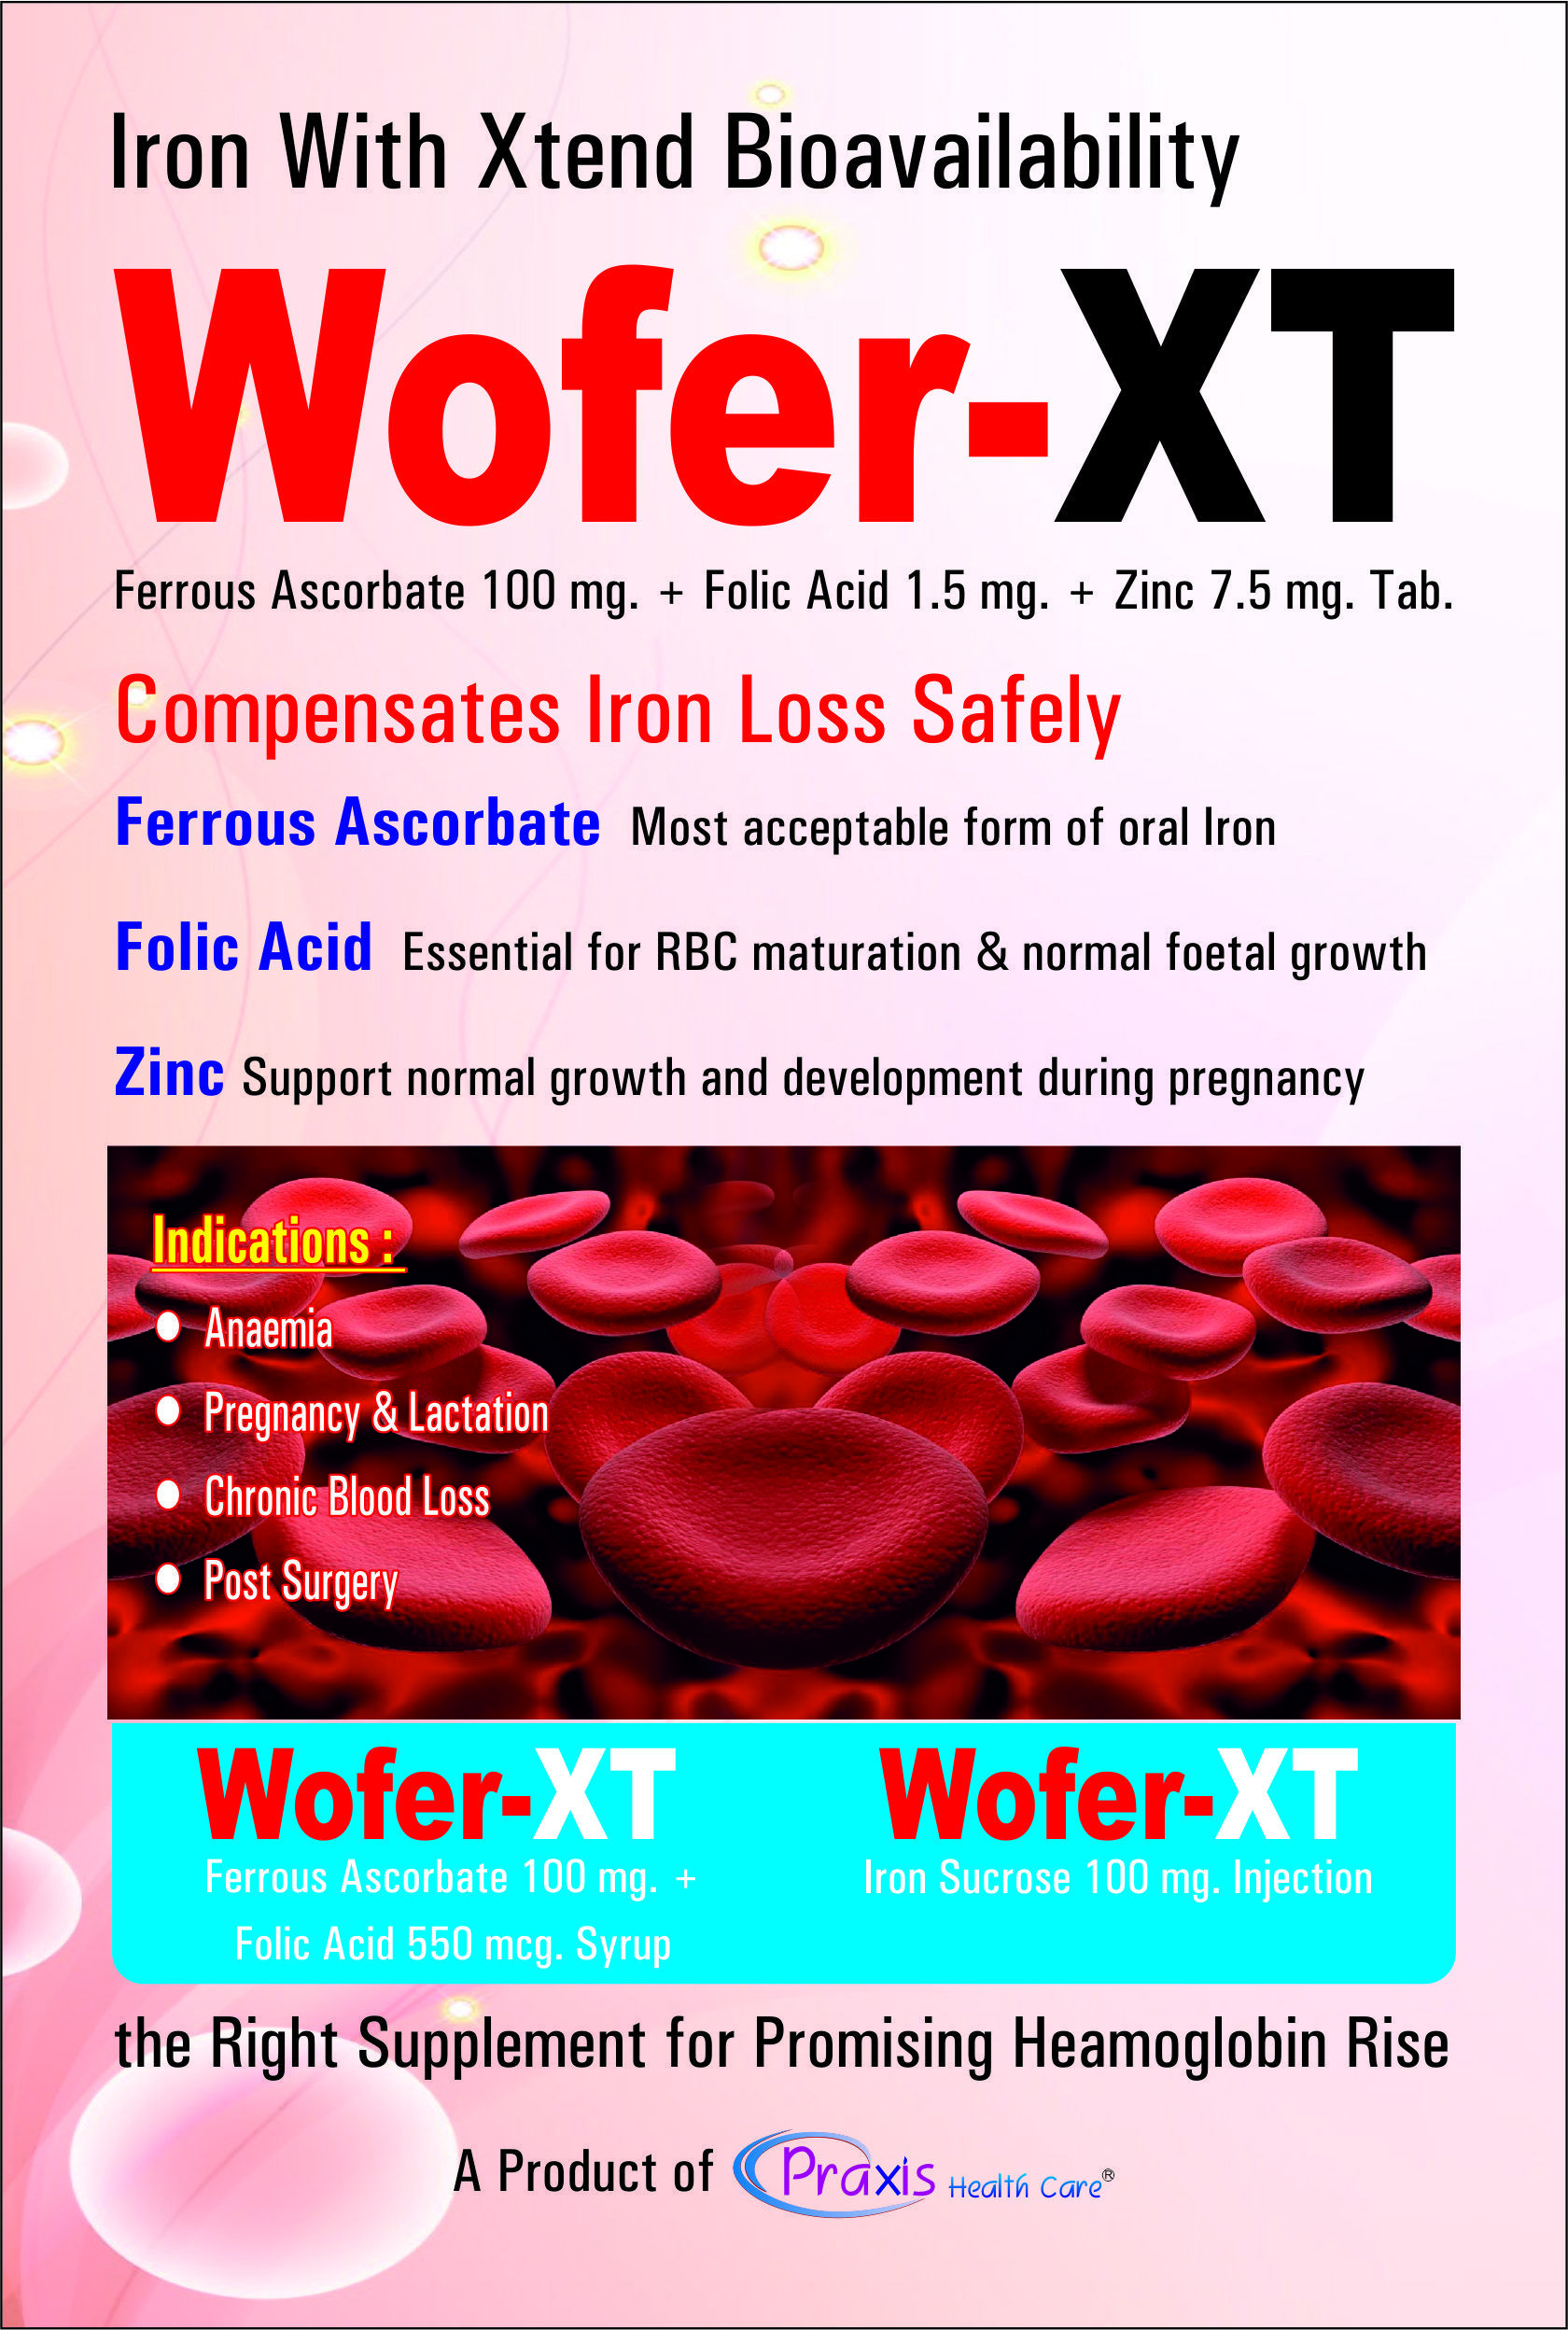 WOFER-XT Tablets